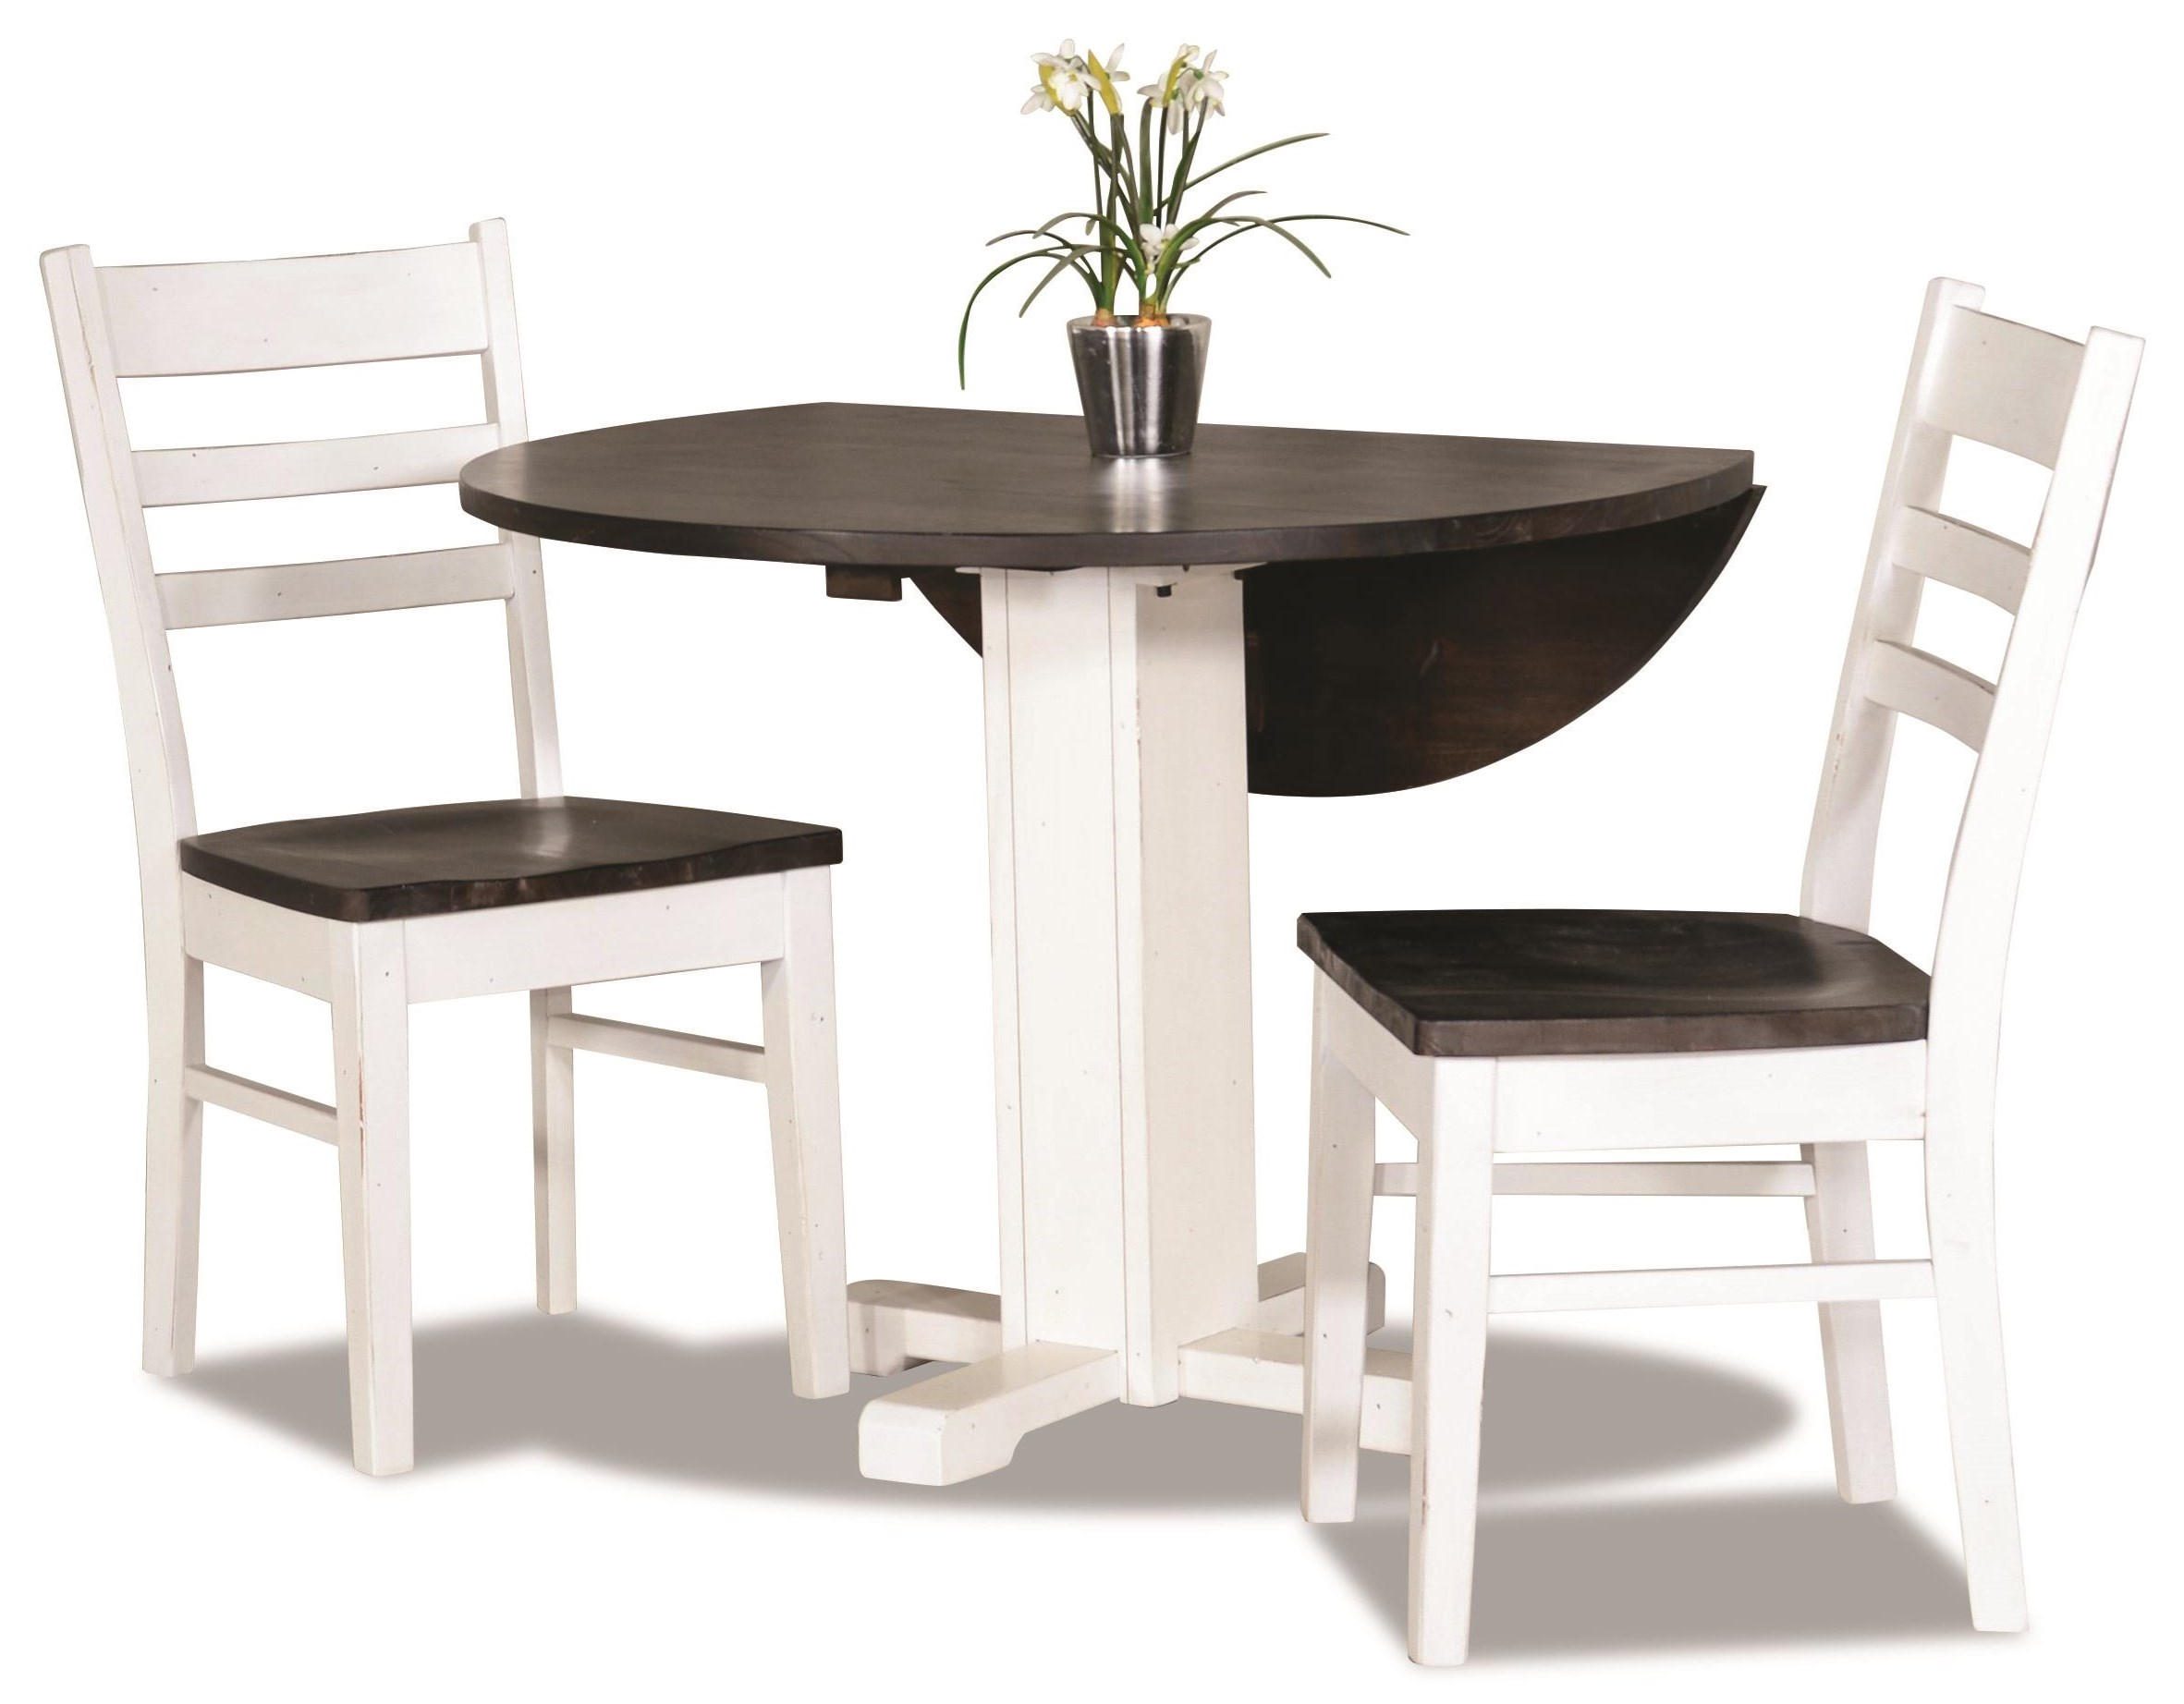 Fairbanks 3-Piece Dining Set